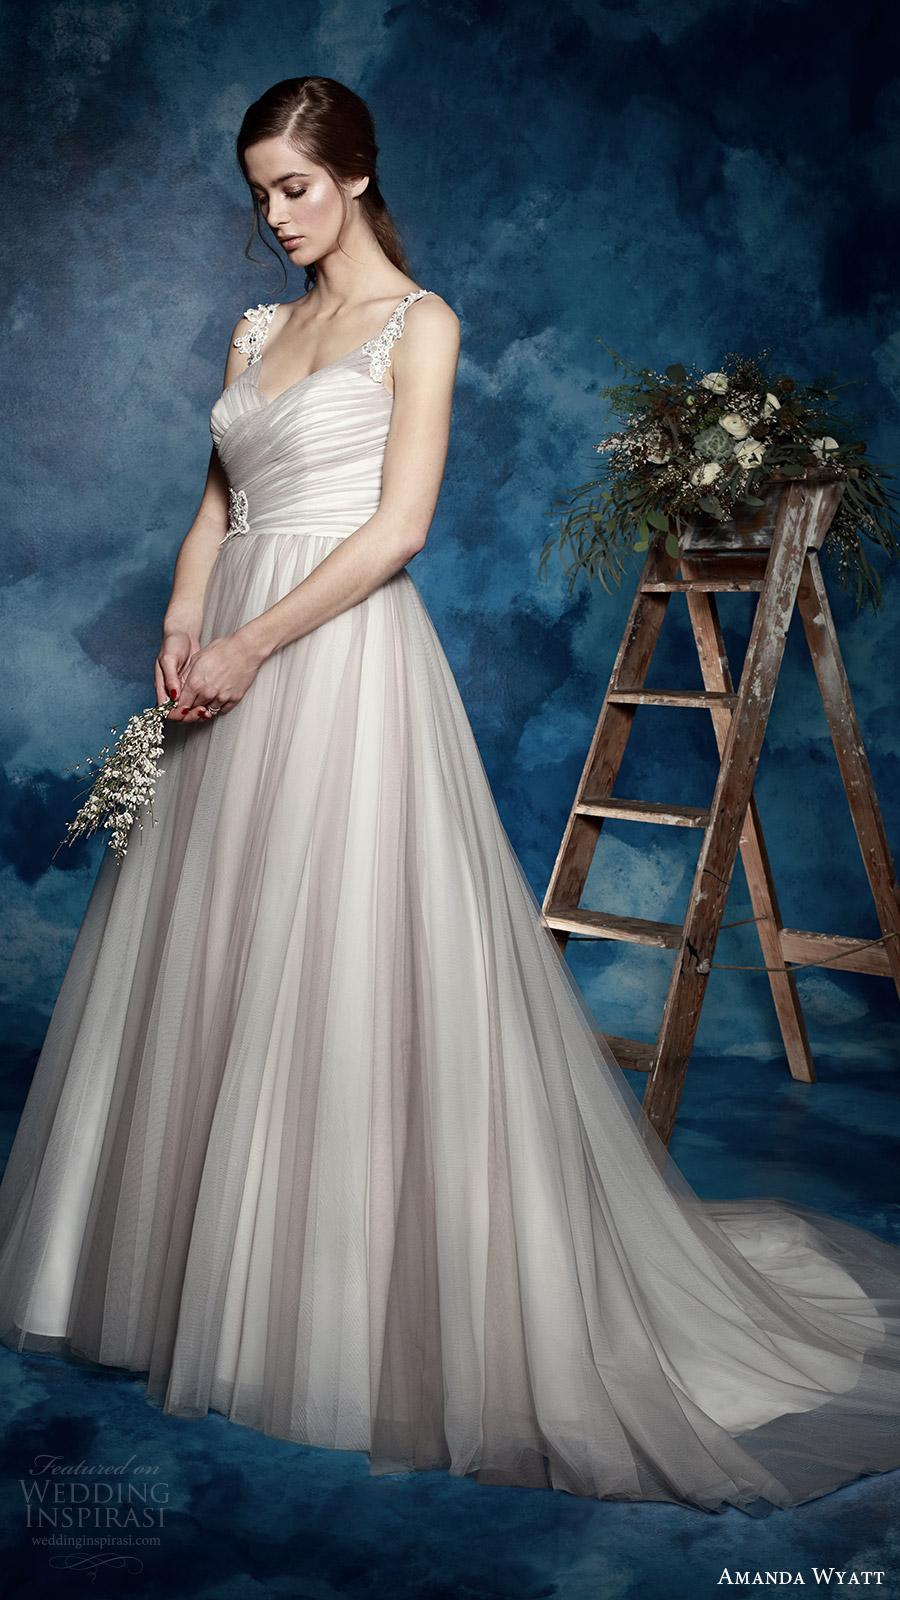 amanda wyatt bridal 2017 sleeveless lace straps vneck ruched surplic bodice a line wedding dress (north) fv grey color romantic train